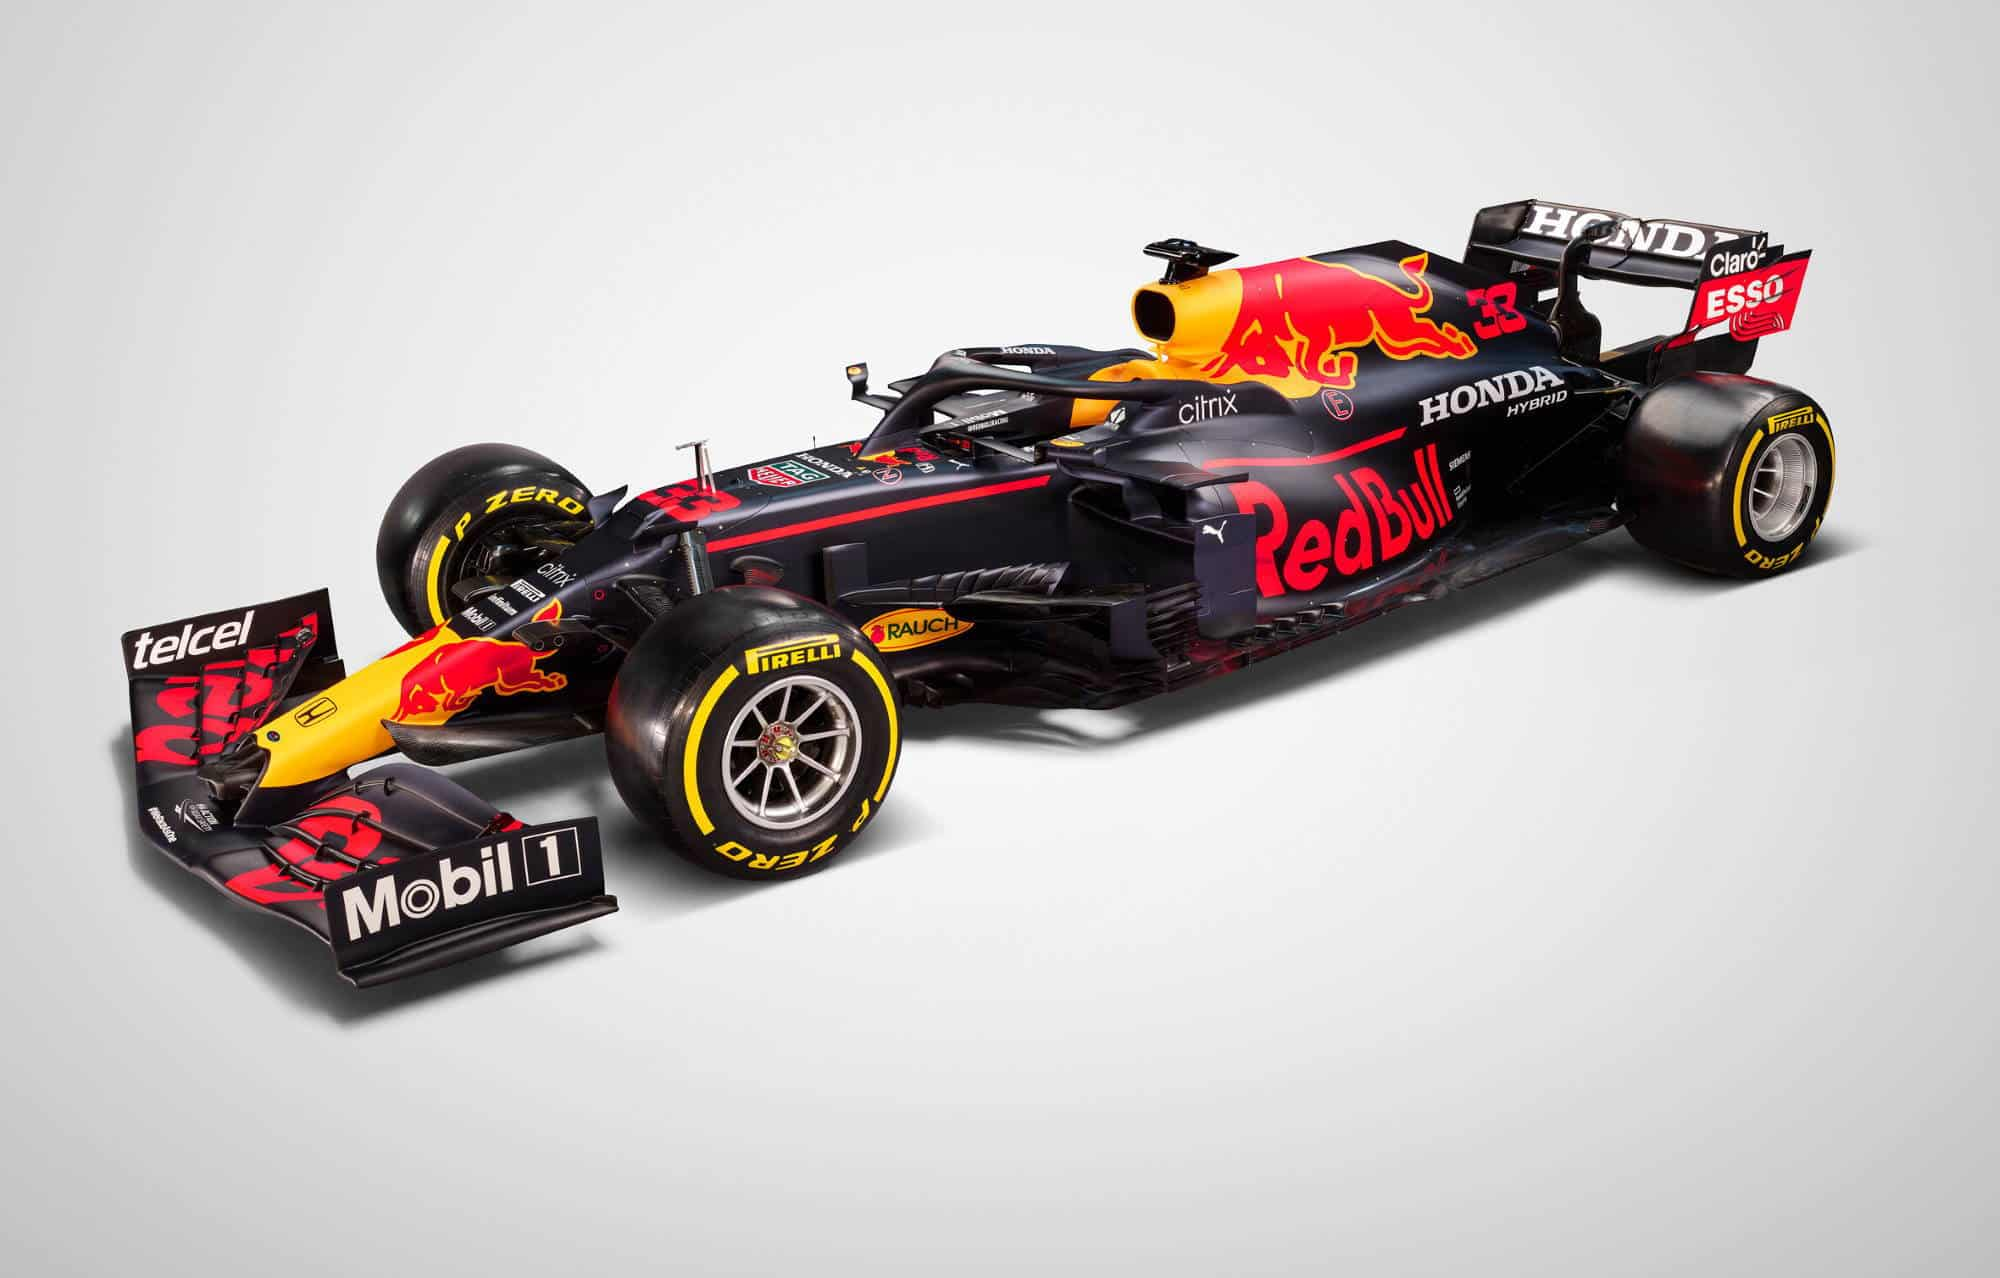 2021 Red Bull RB16B Studio Photo side Photo Red Bull